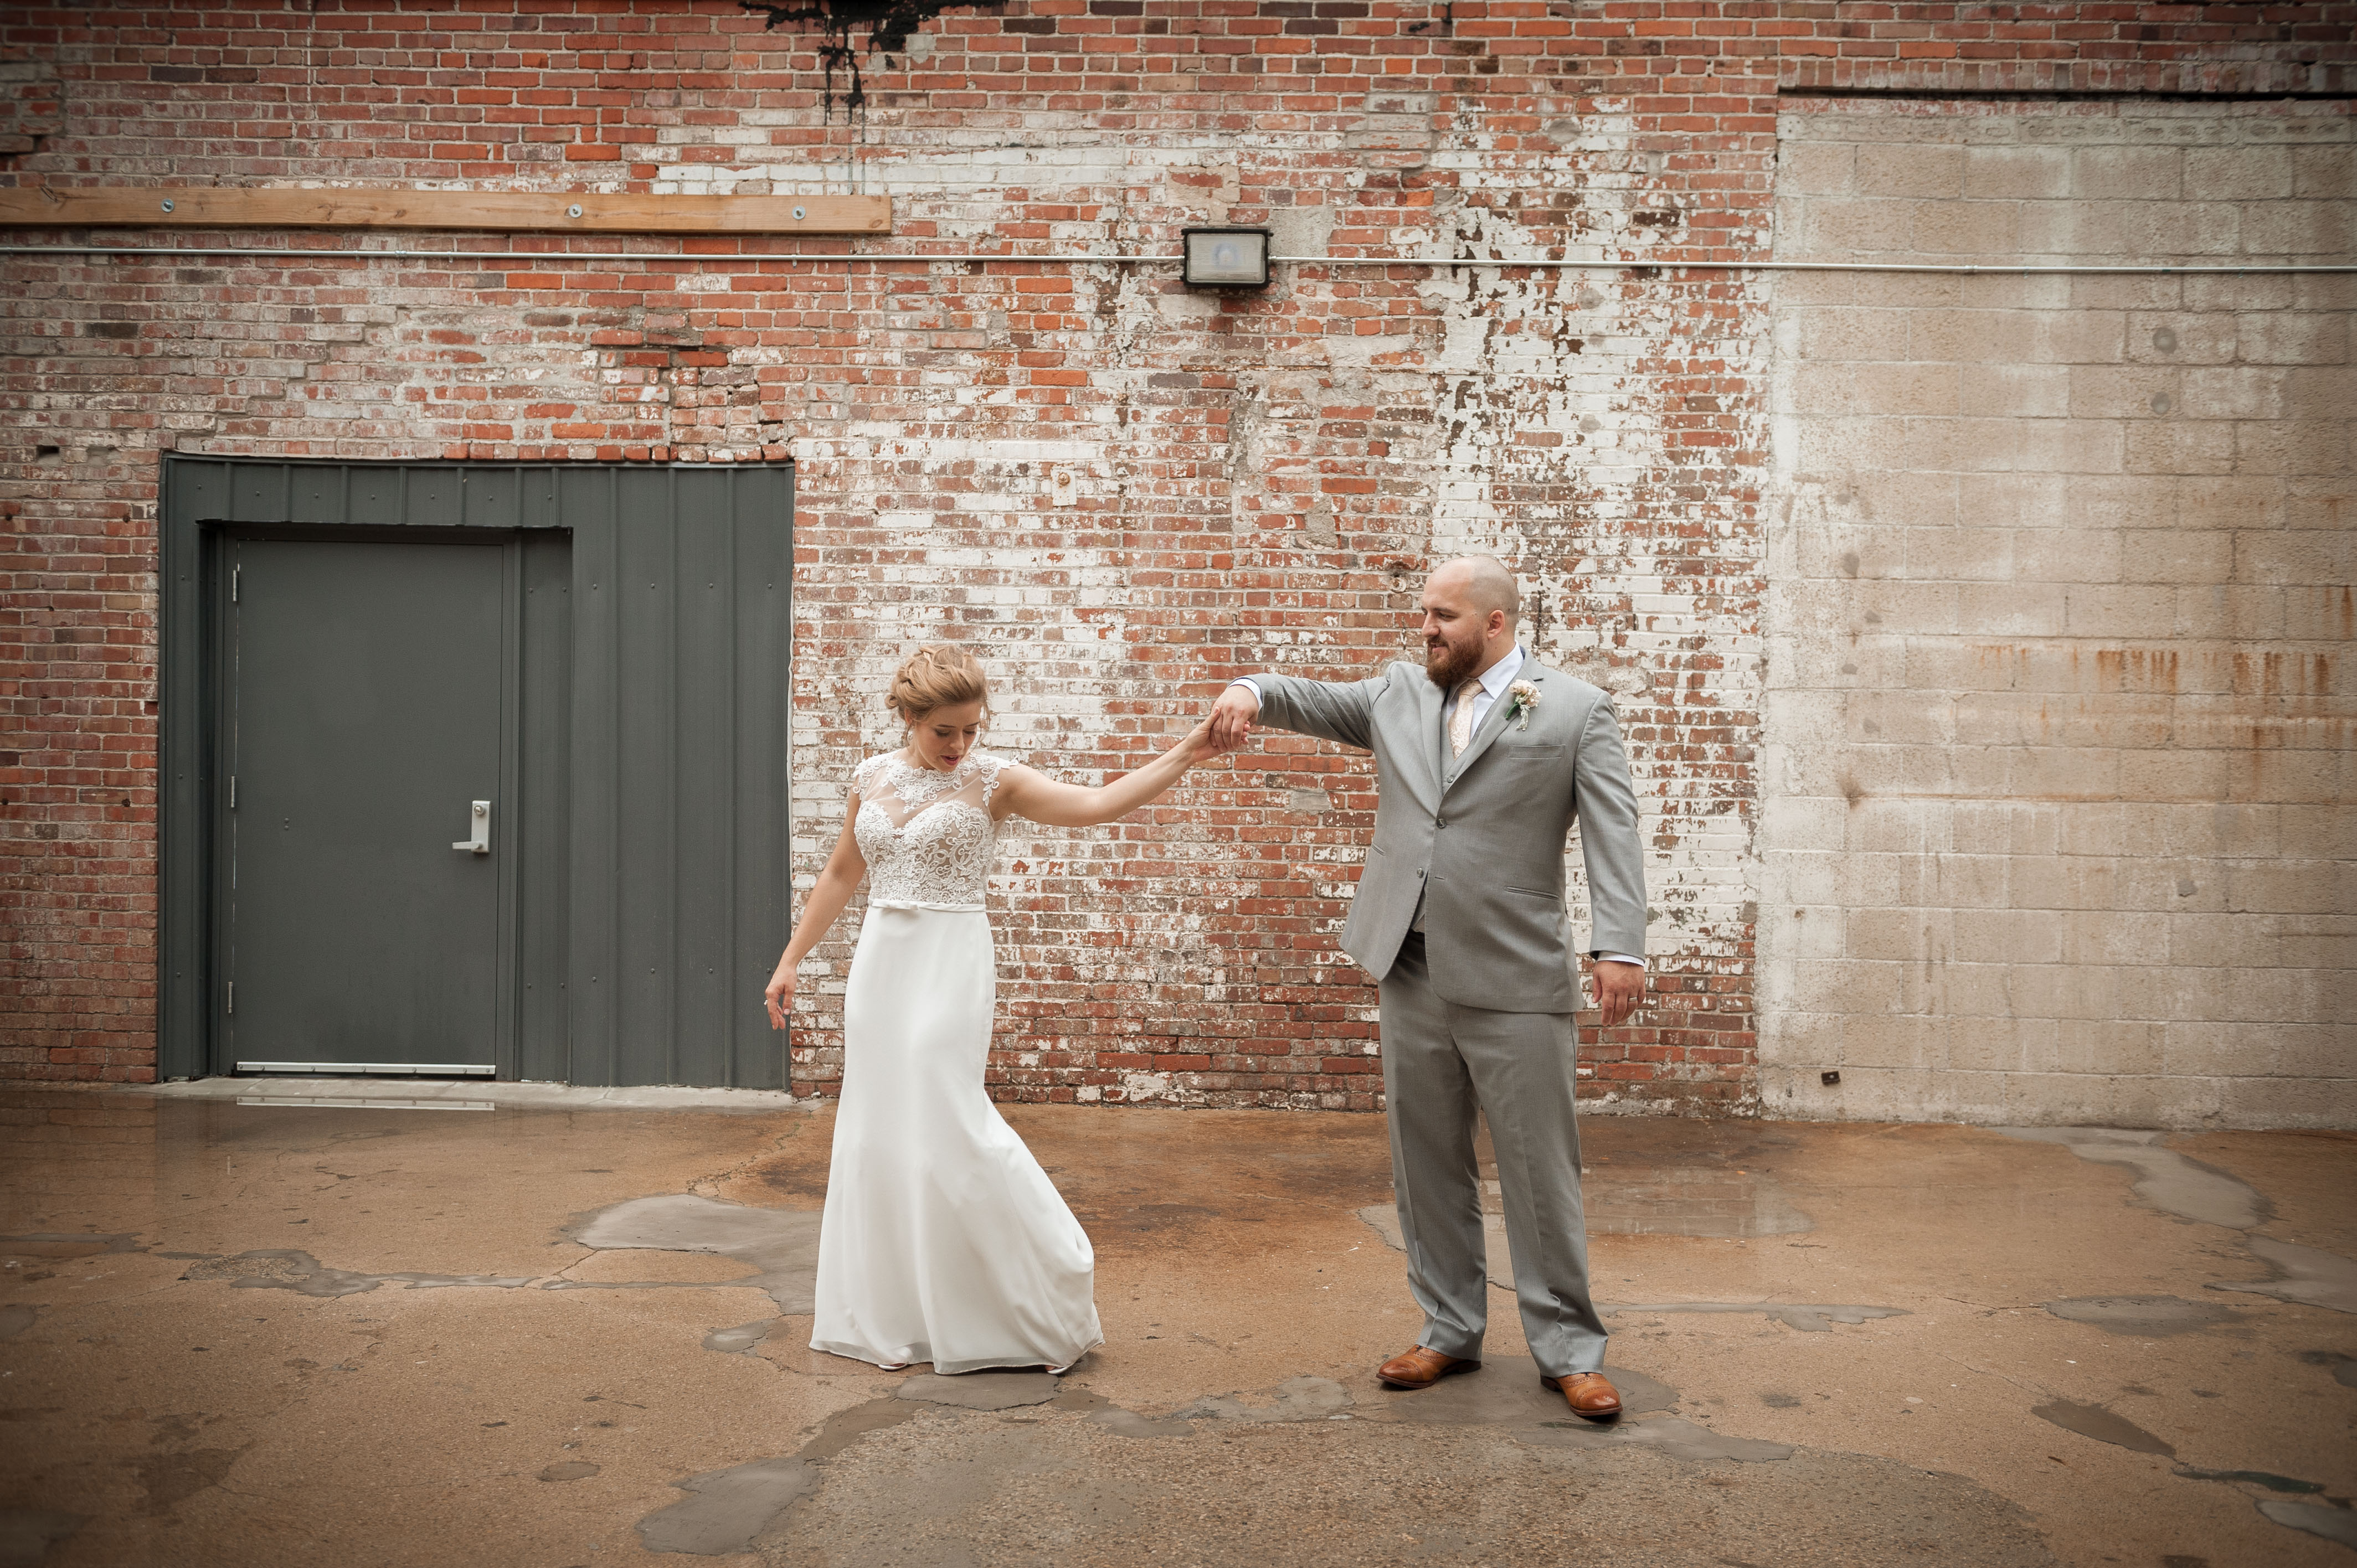 Bride and groom dancing in front of rustic brick warehouse